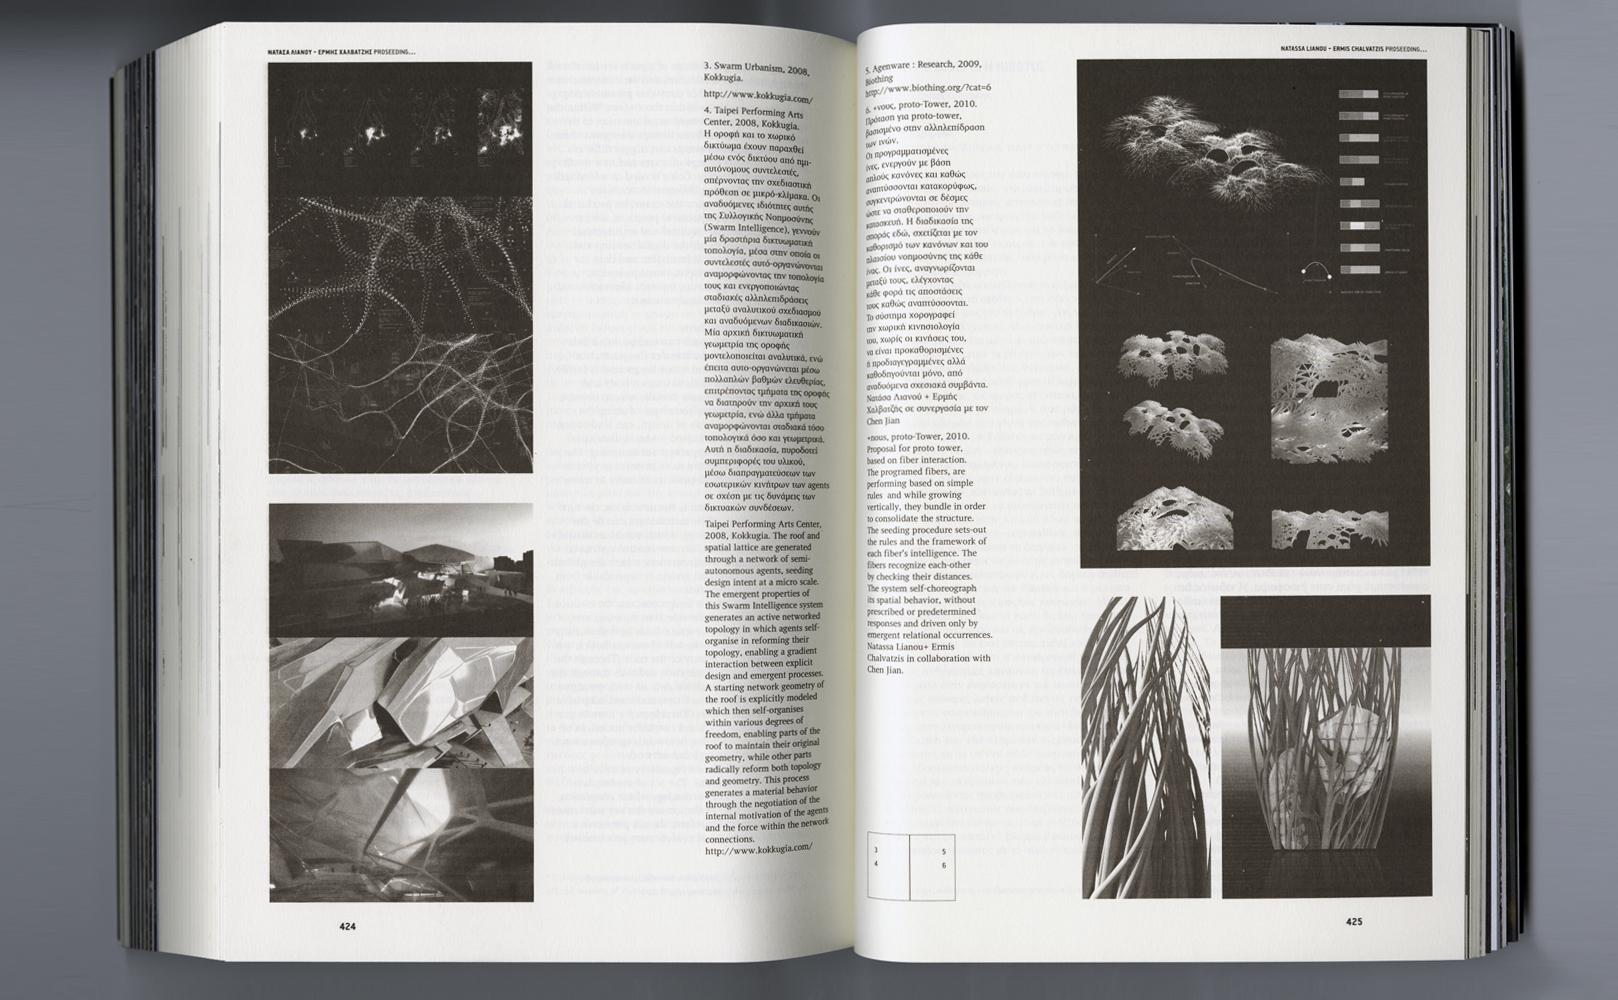 biennale_catalogue.jpg